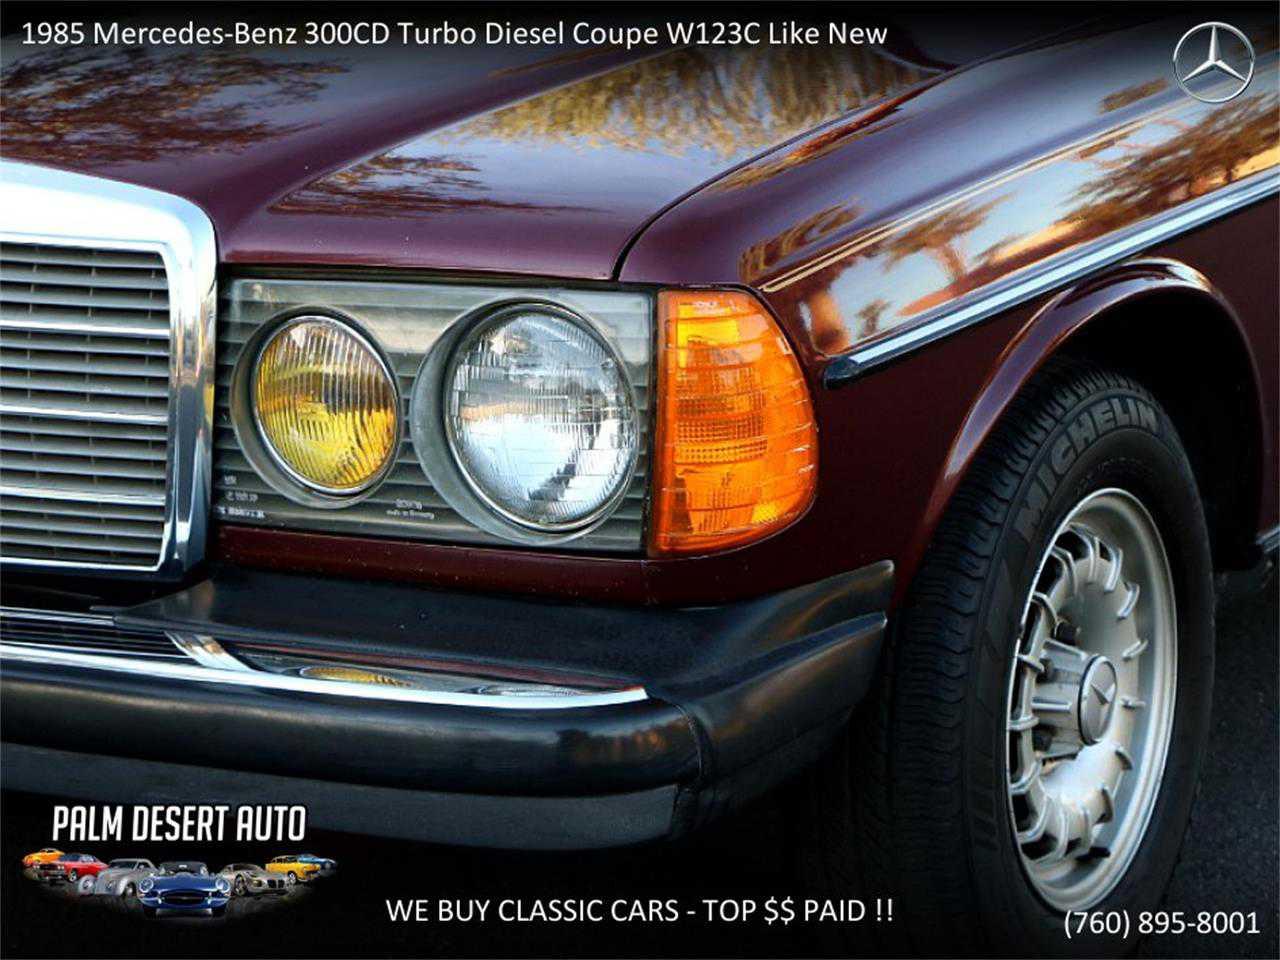 1985 Mercedes-Benz 300CD for sale in Palm Desert, CA